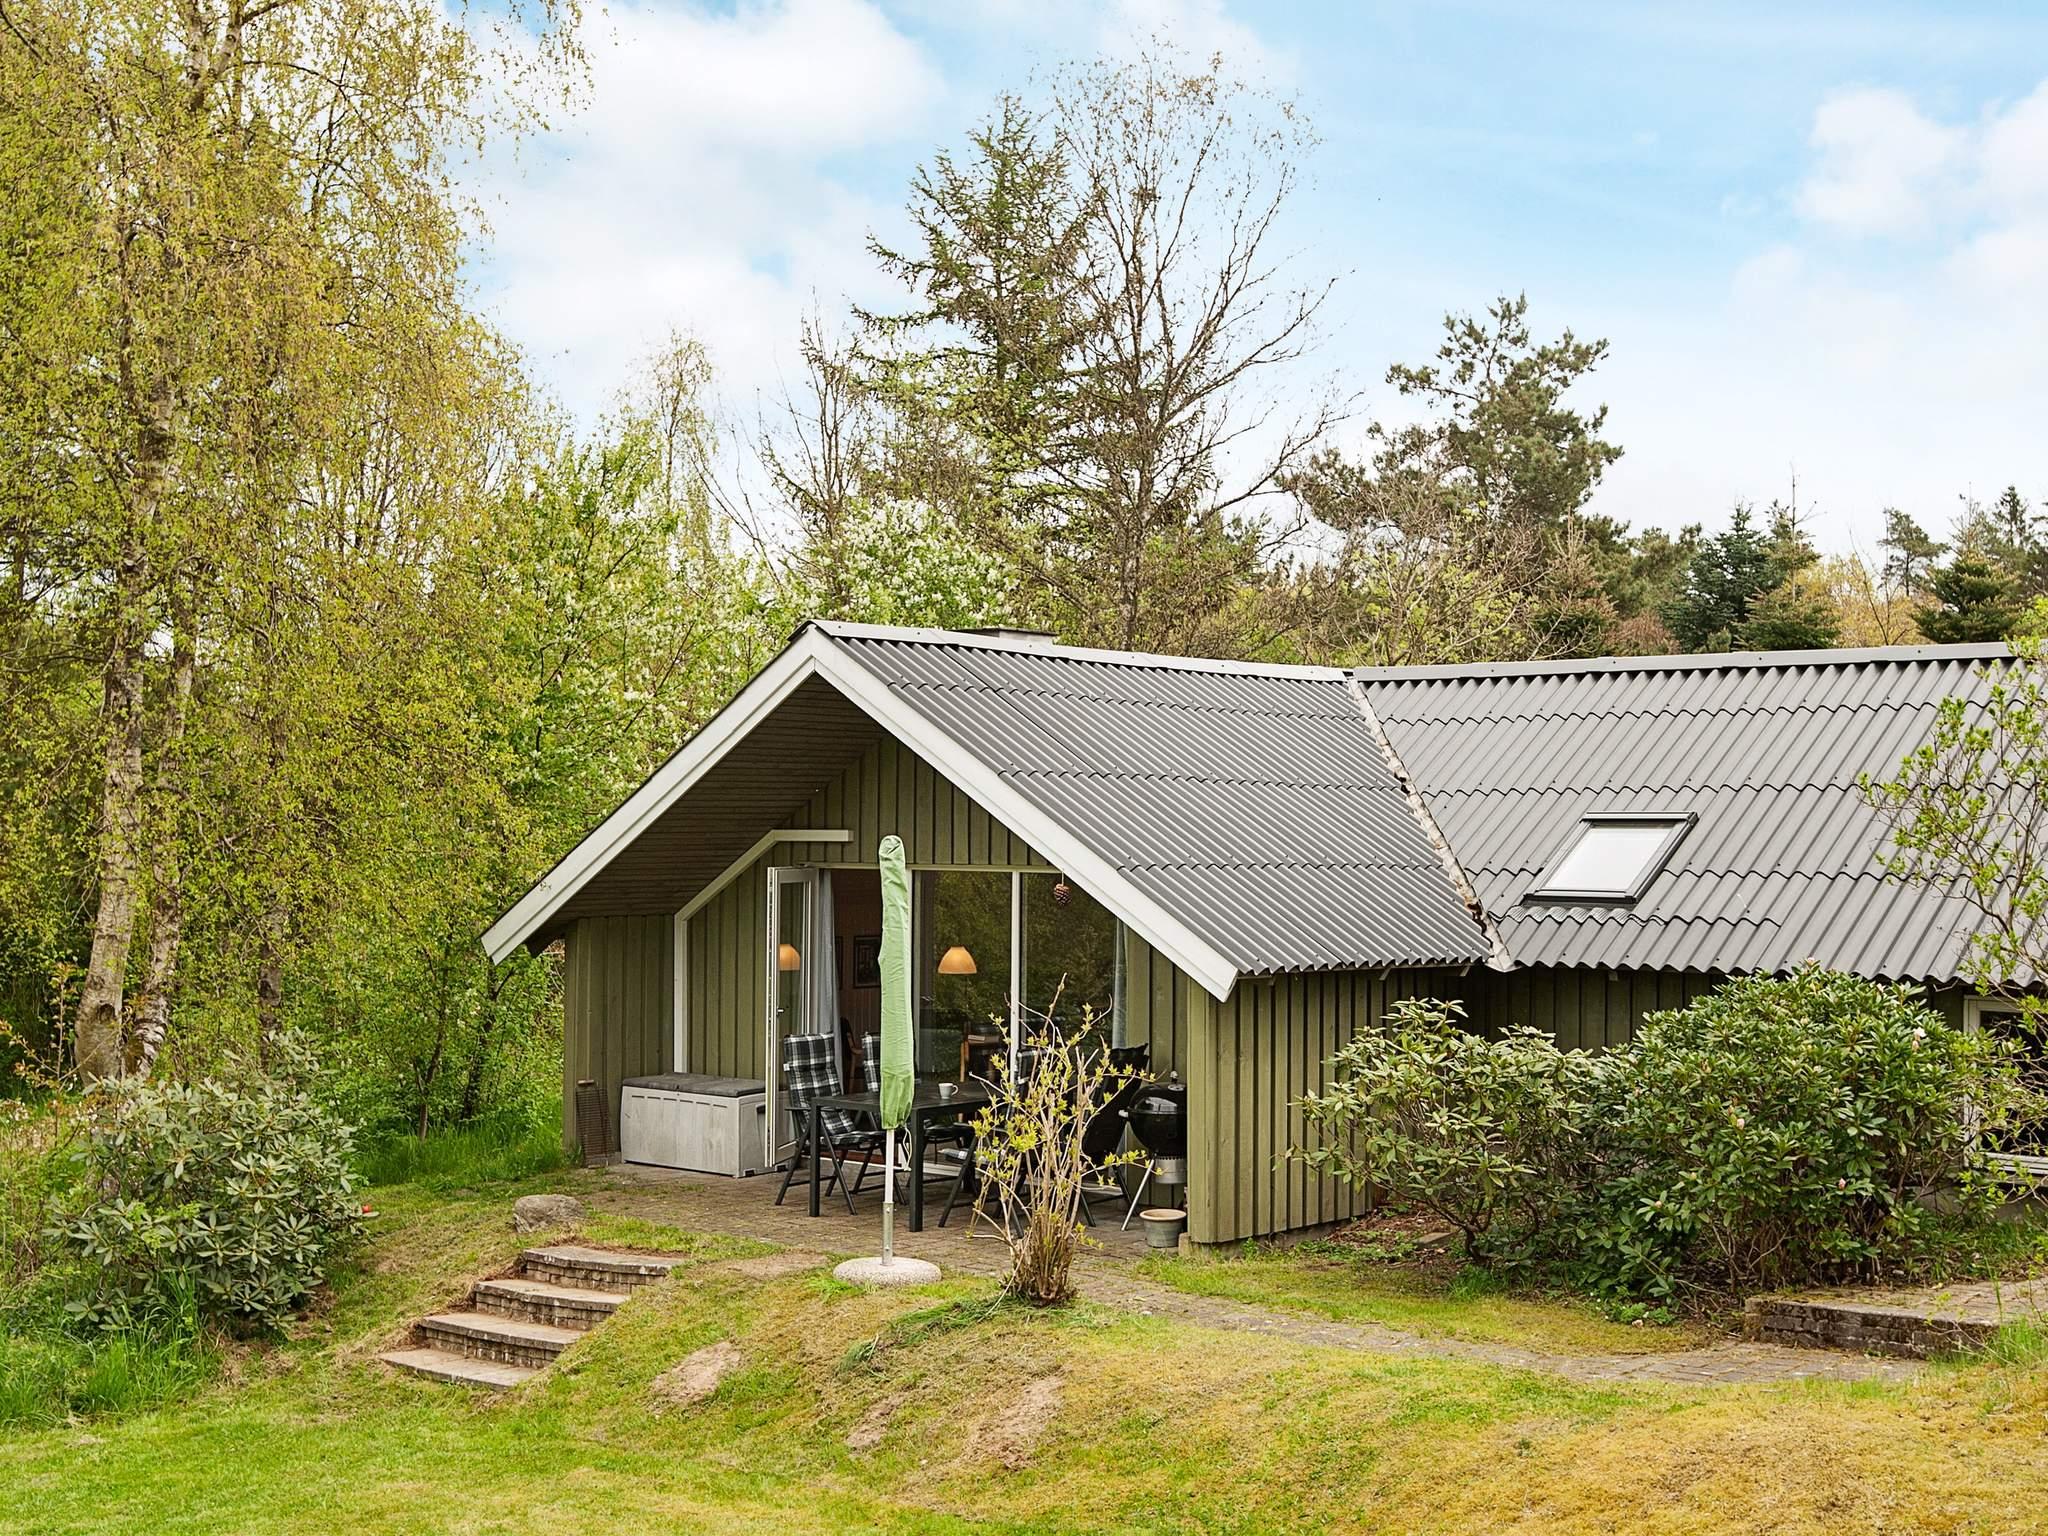 Ferienhaus Ry (83836), Ry, , Ostjütland, Dänemark, Bild 20